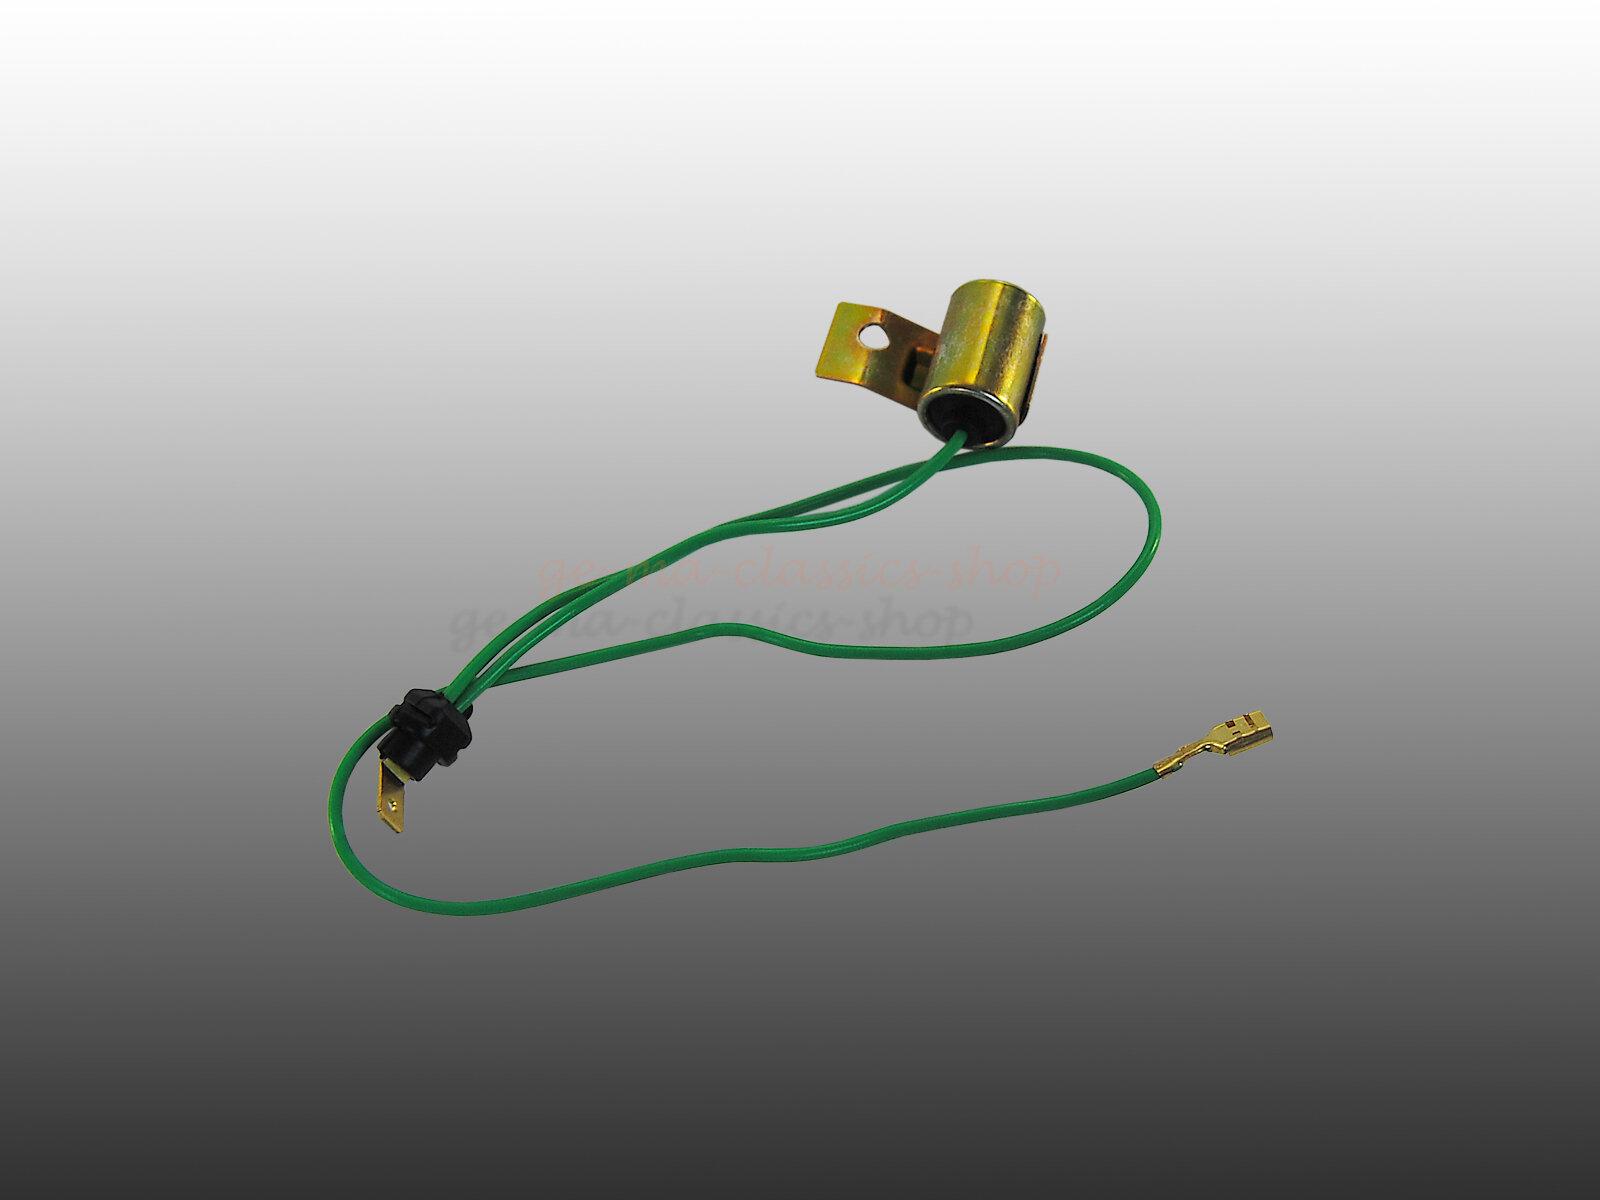 Kondensator für VW Typ1 ab Bj 73 & Typ2 ab Bj 74